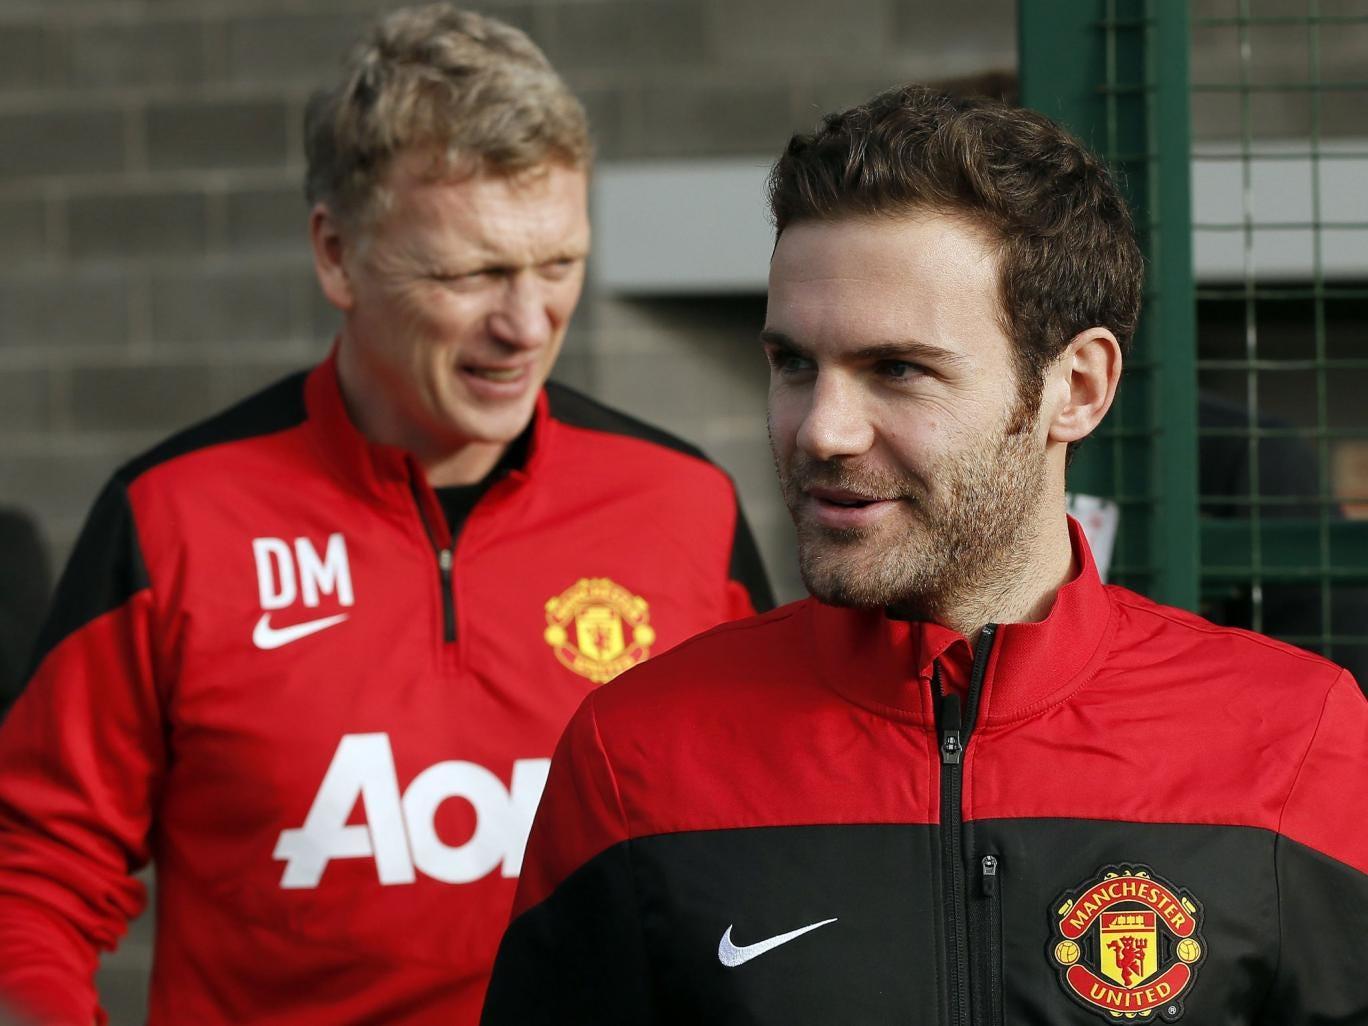 Juan Mata (right) and David Moyes arrive at Carrington training complex on Monday